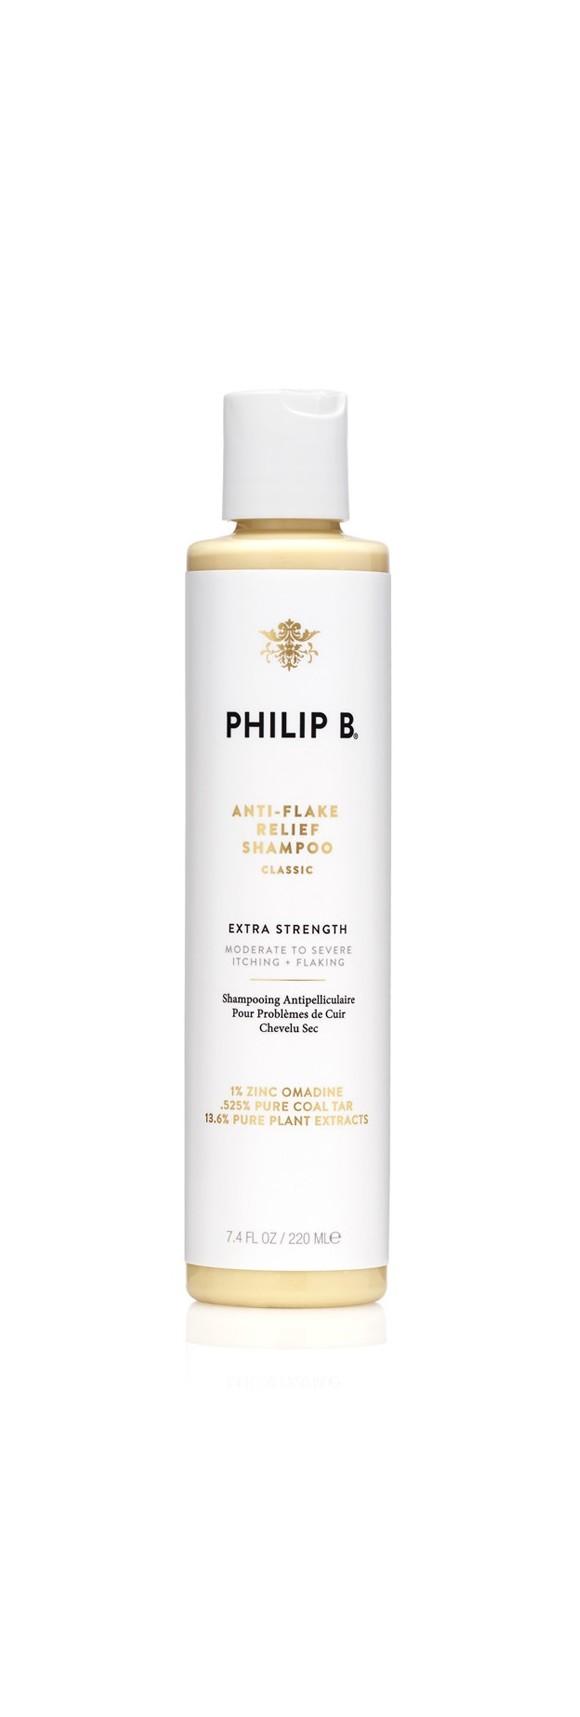 Philip B - Anti-Flake Relief Shampoo 220 ml